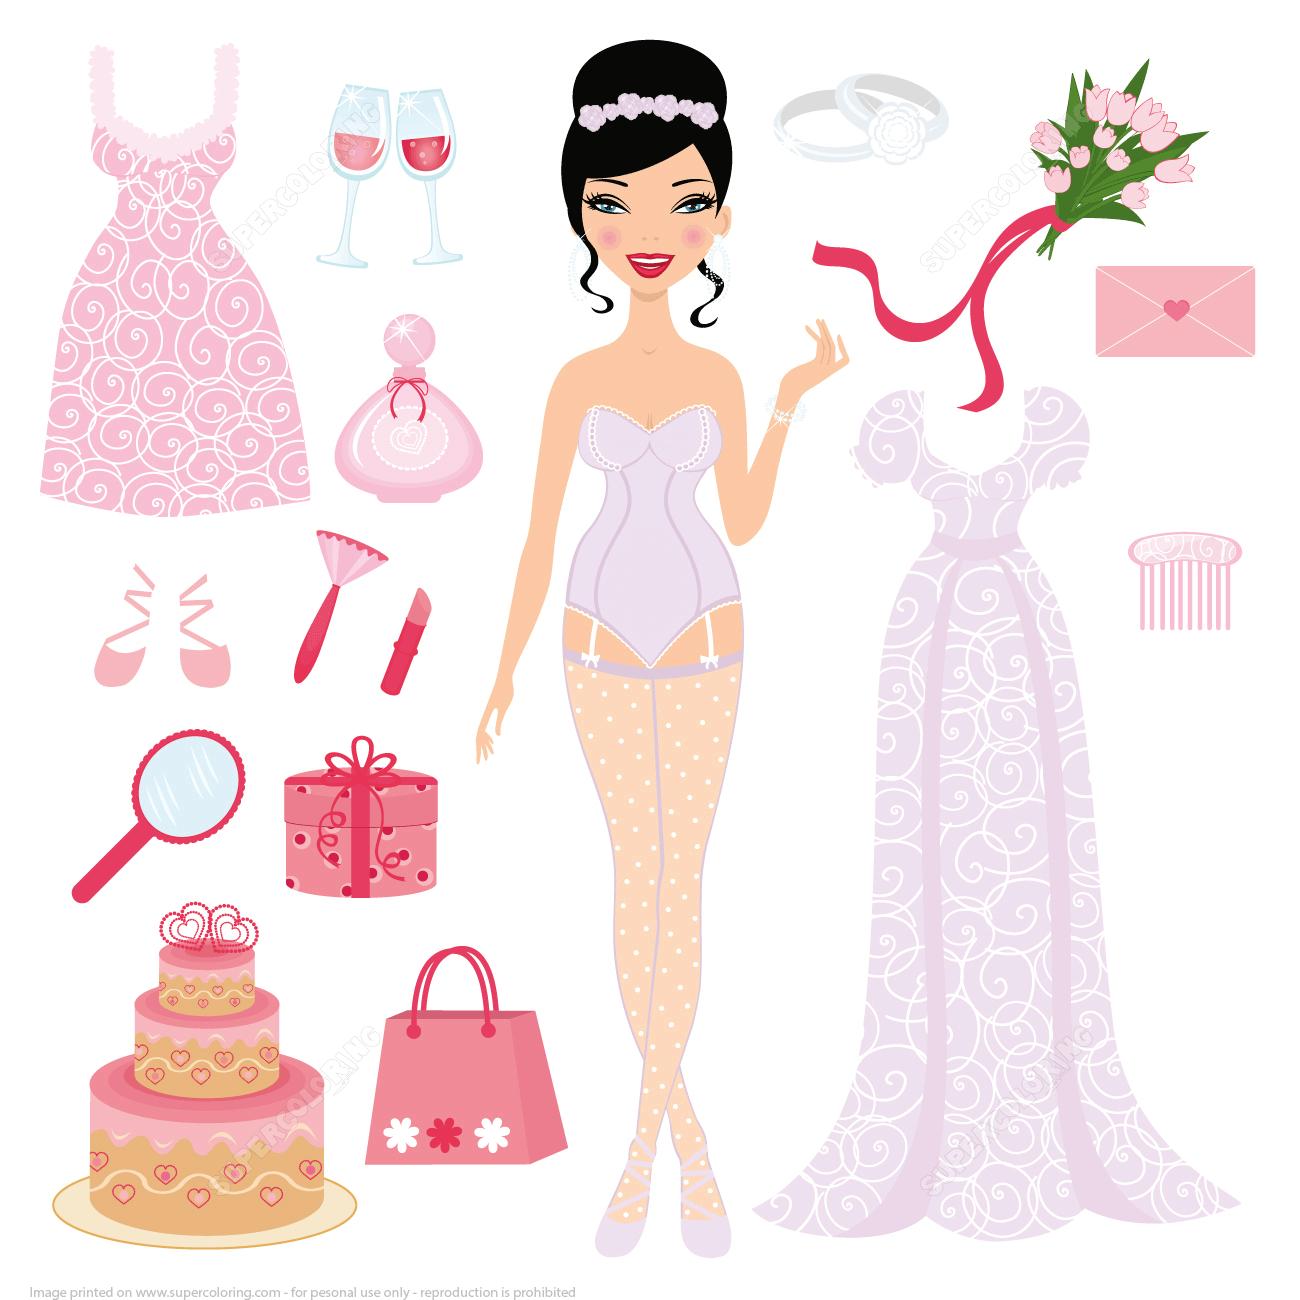 Dress Up Paper Dolls   Free Printable Papercraft Templates - Free Printable Dress Up Paper Dolls